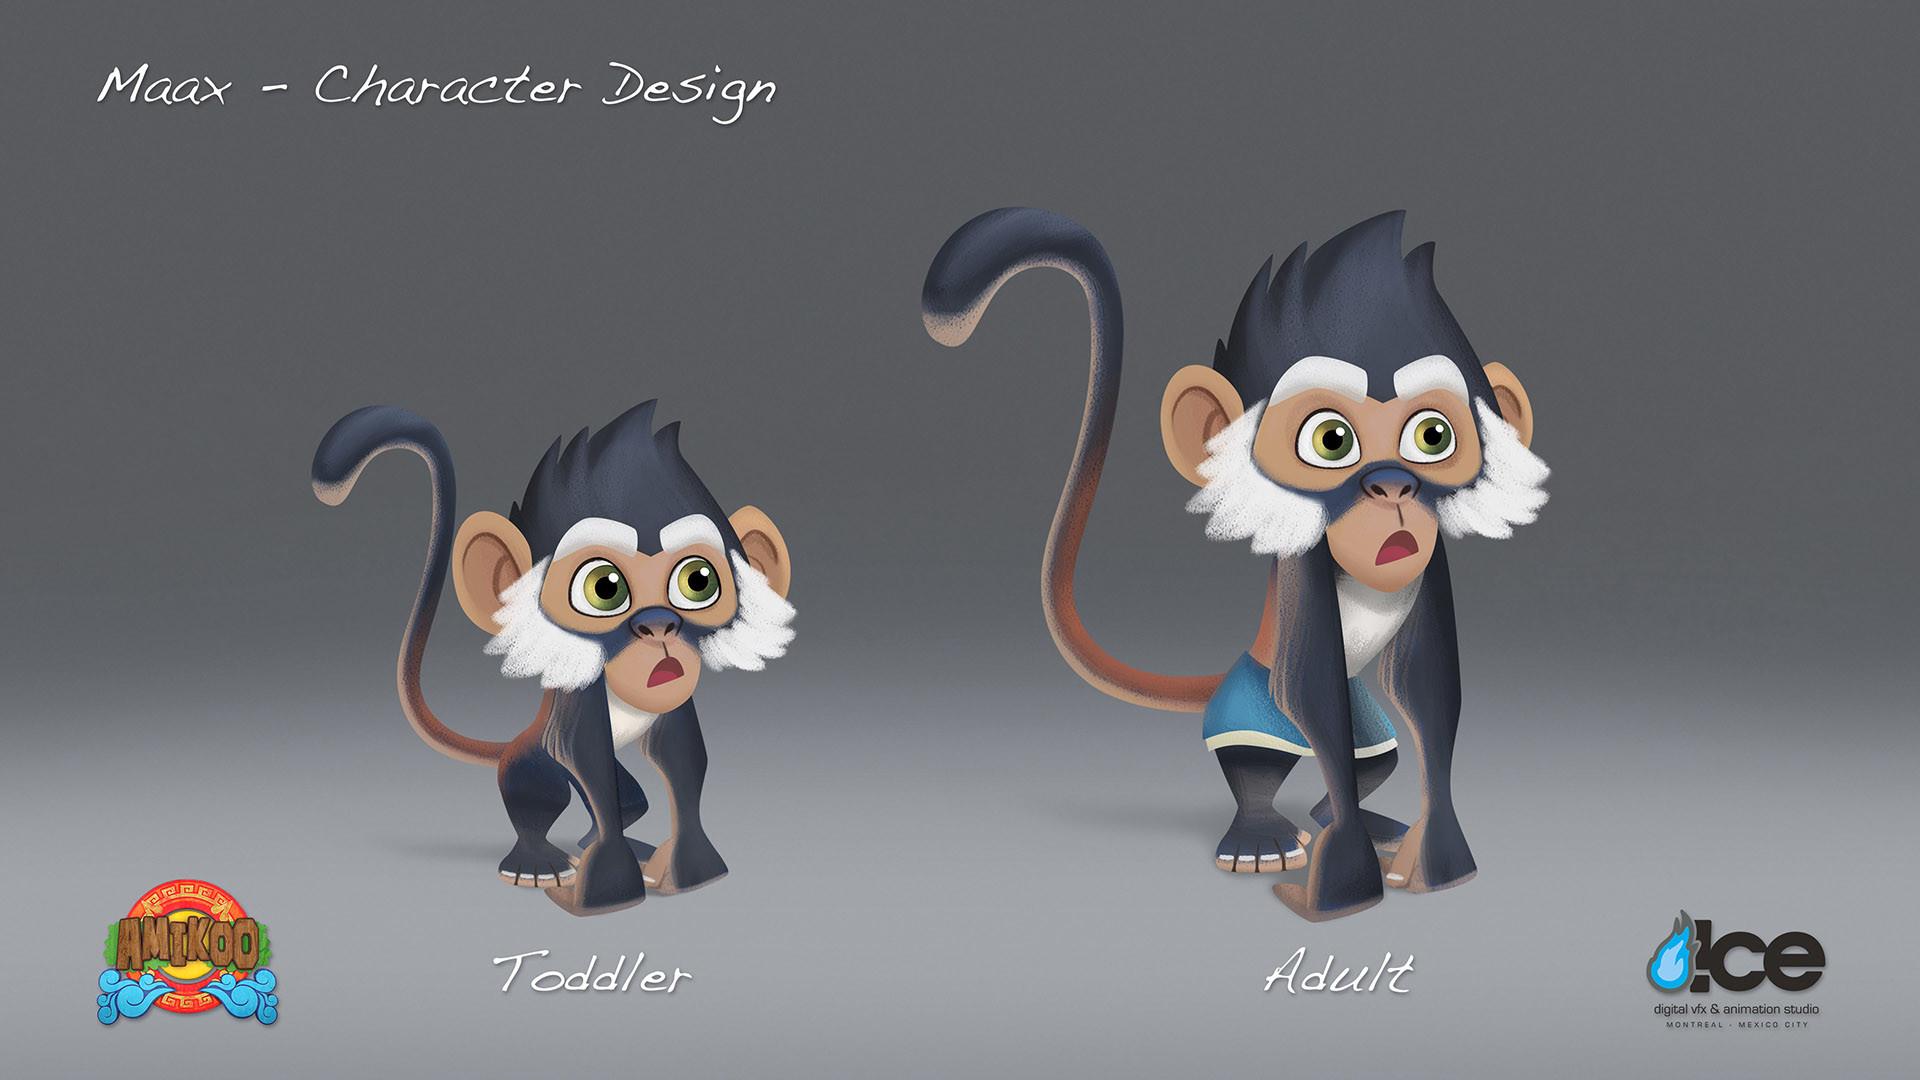 Dave arredondo amikoo maax characterdesignhdtv